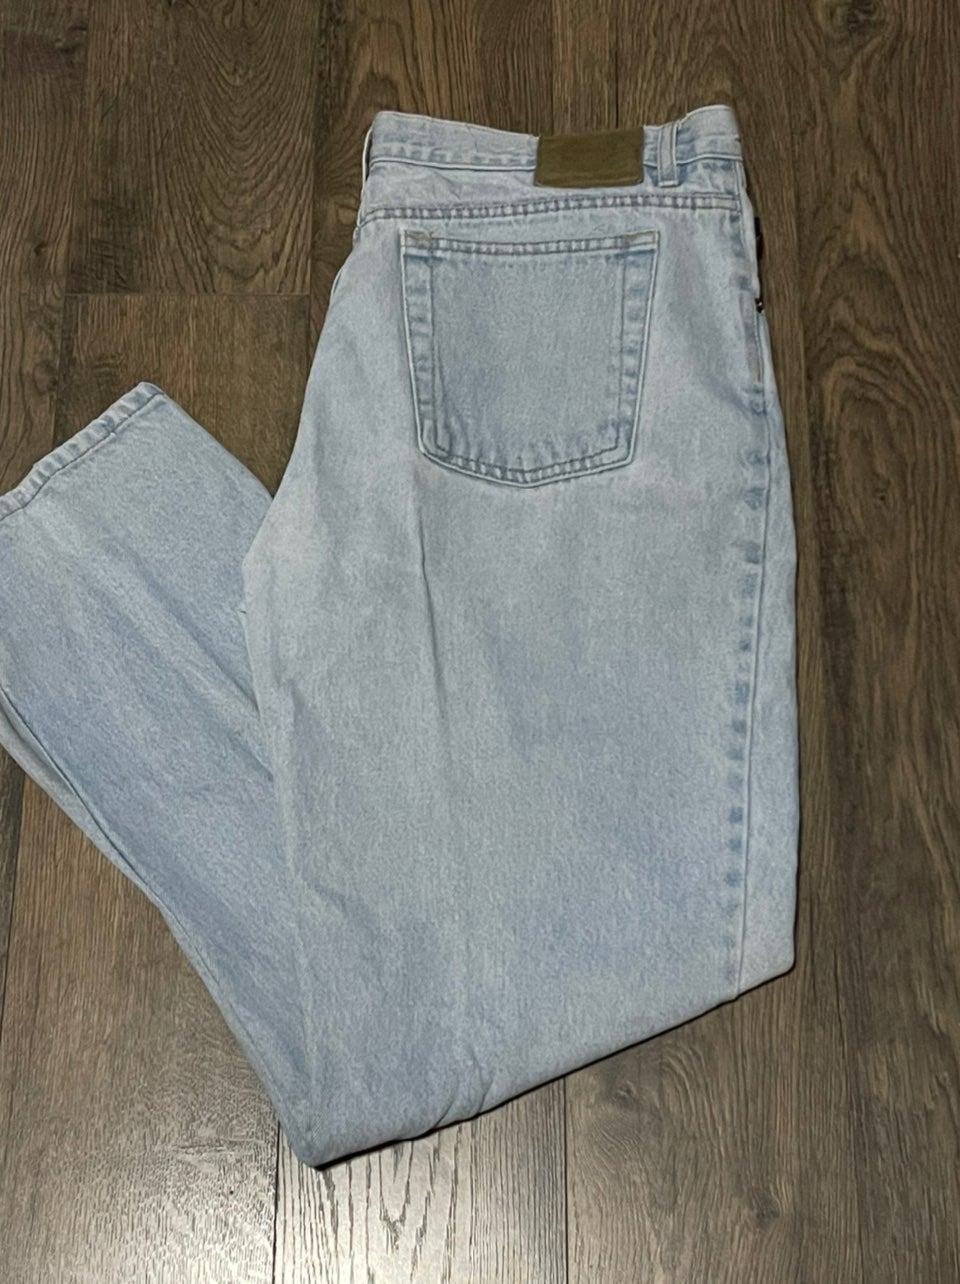 Vintage Bugle Boy Jeans 90's